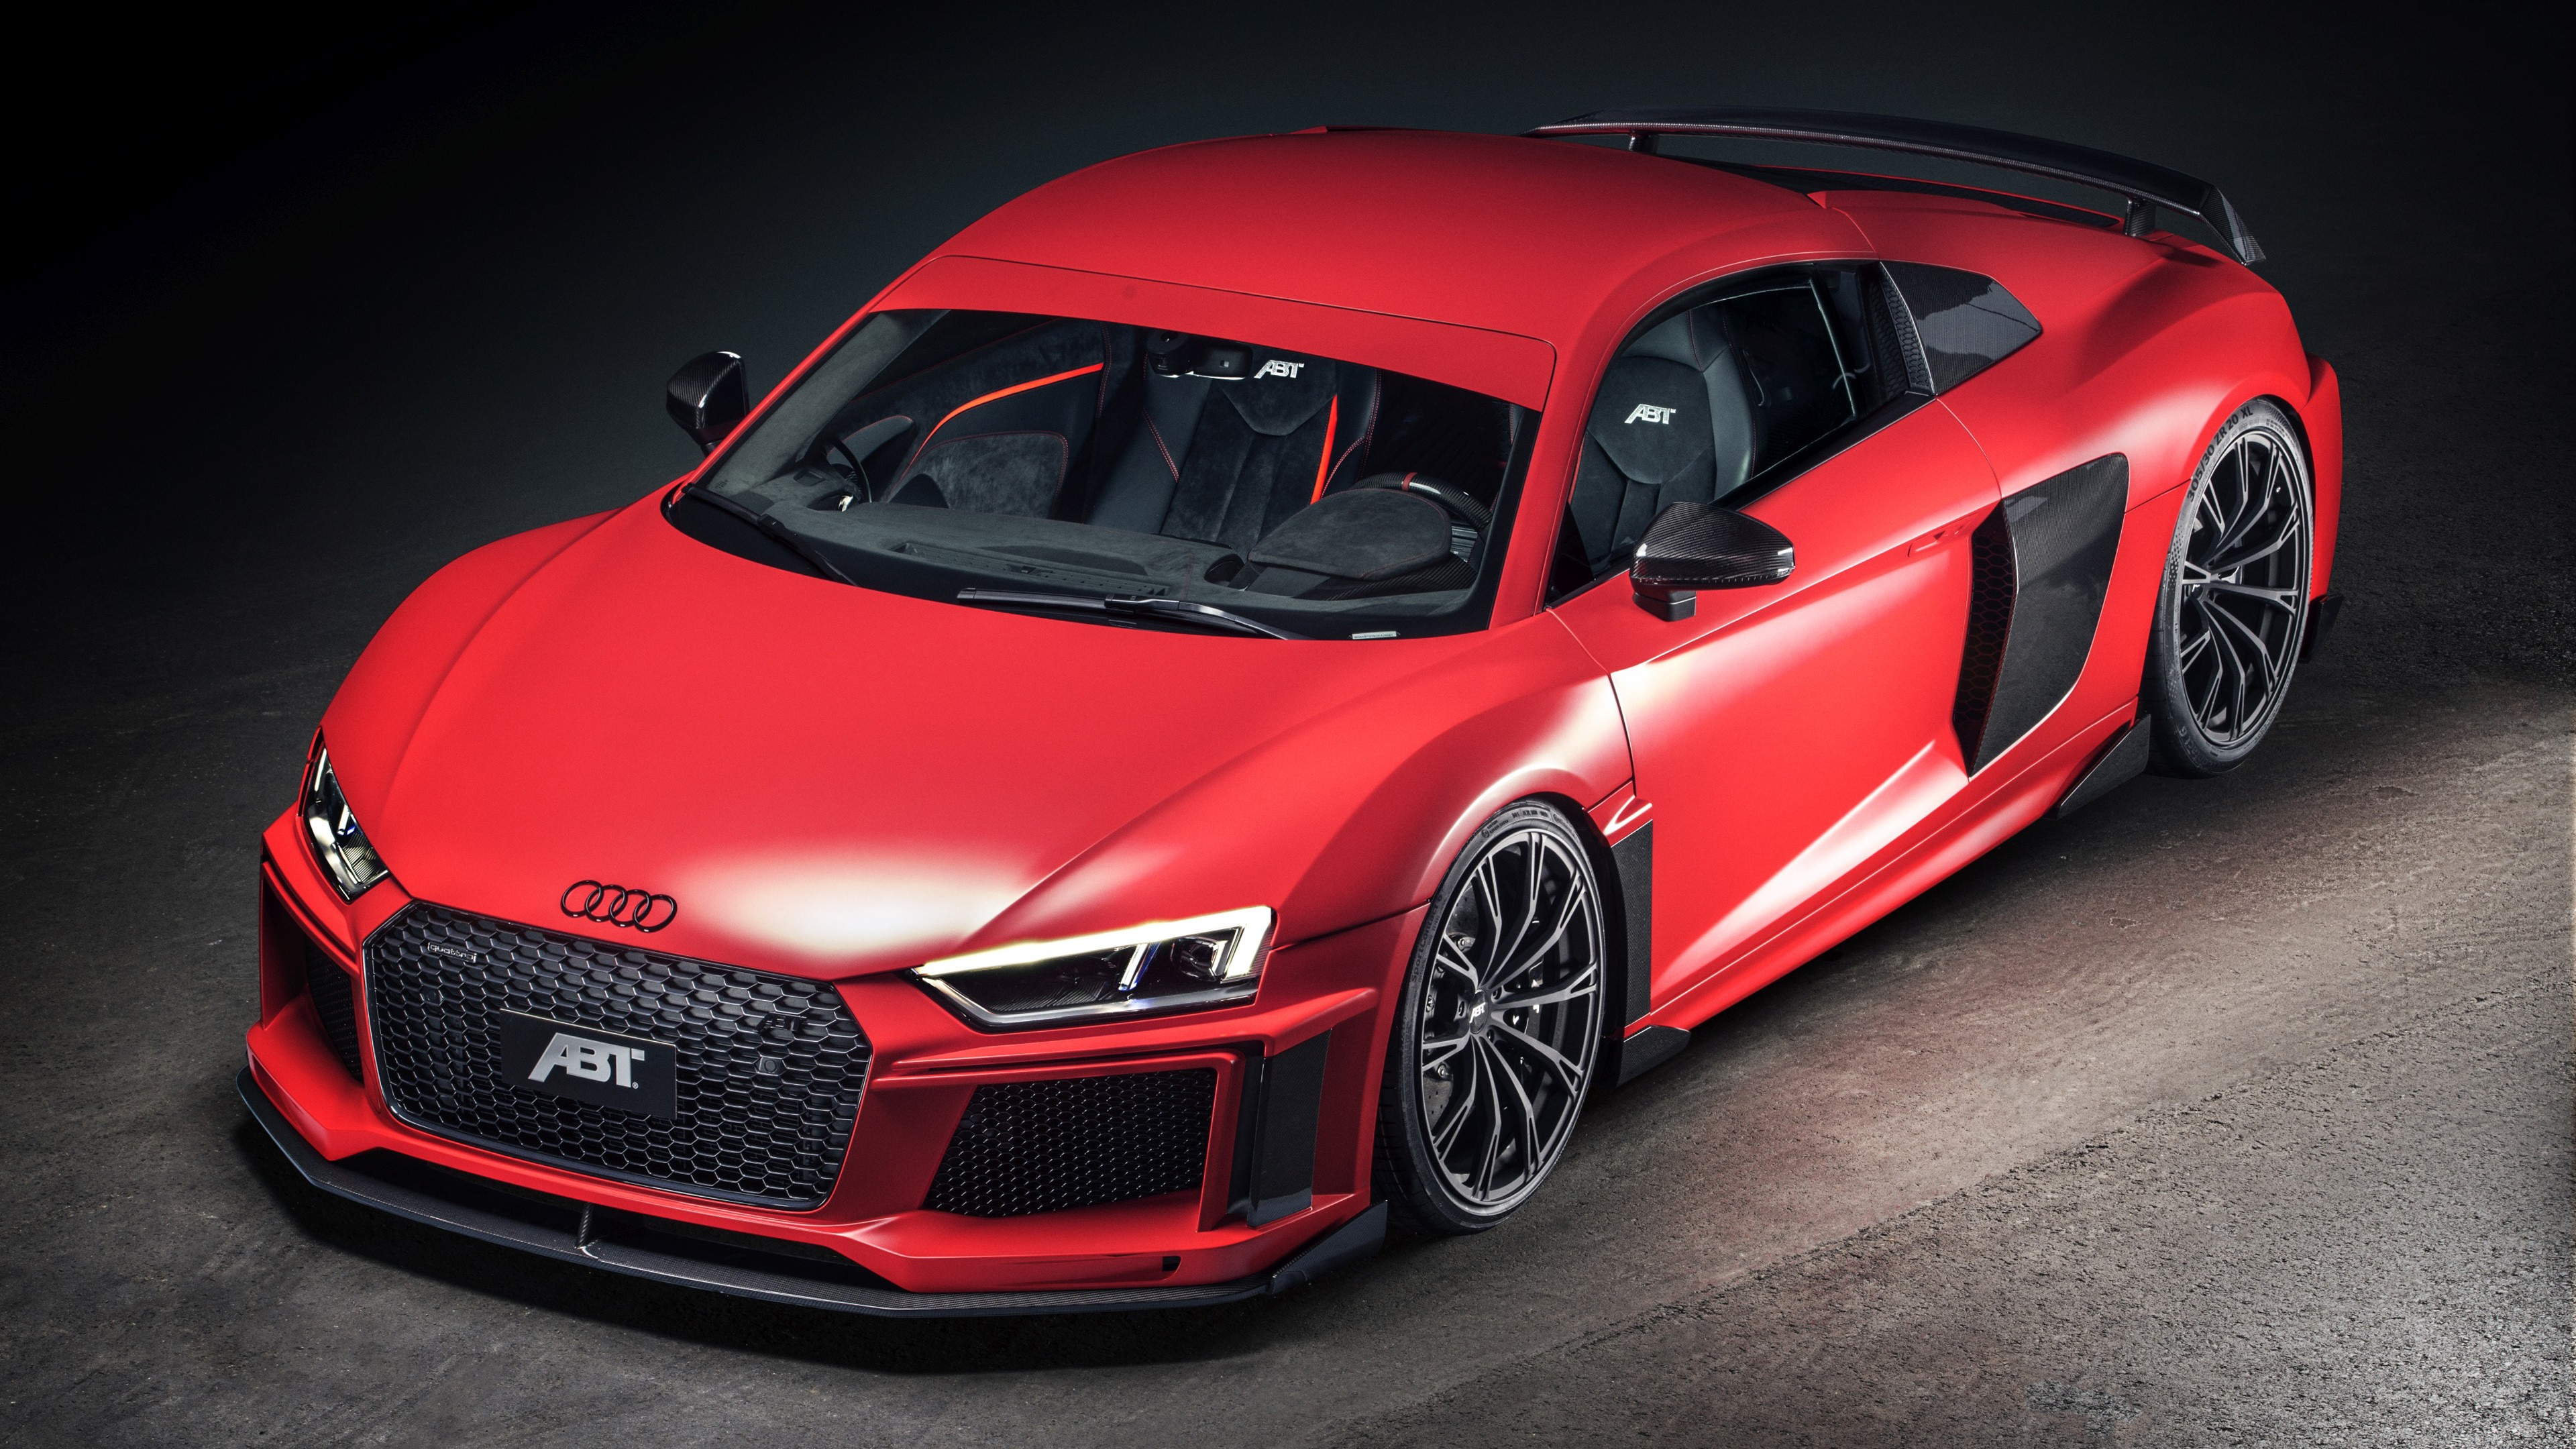 Audi ABT Red and Carbon без регистрации